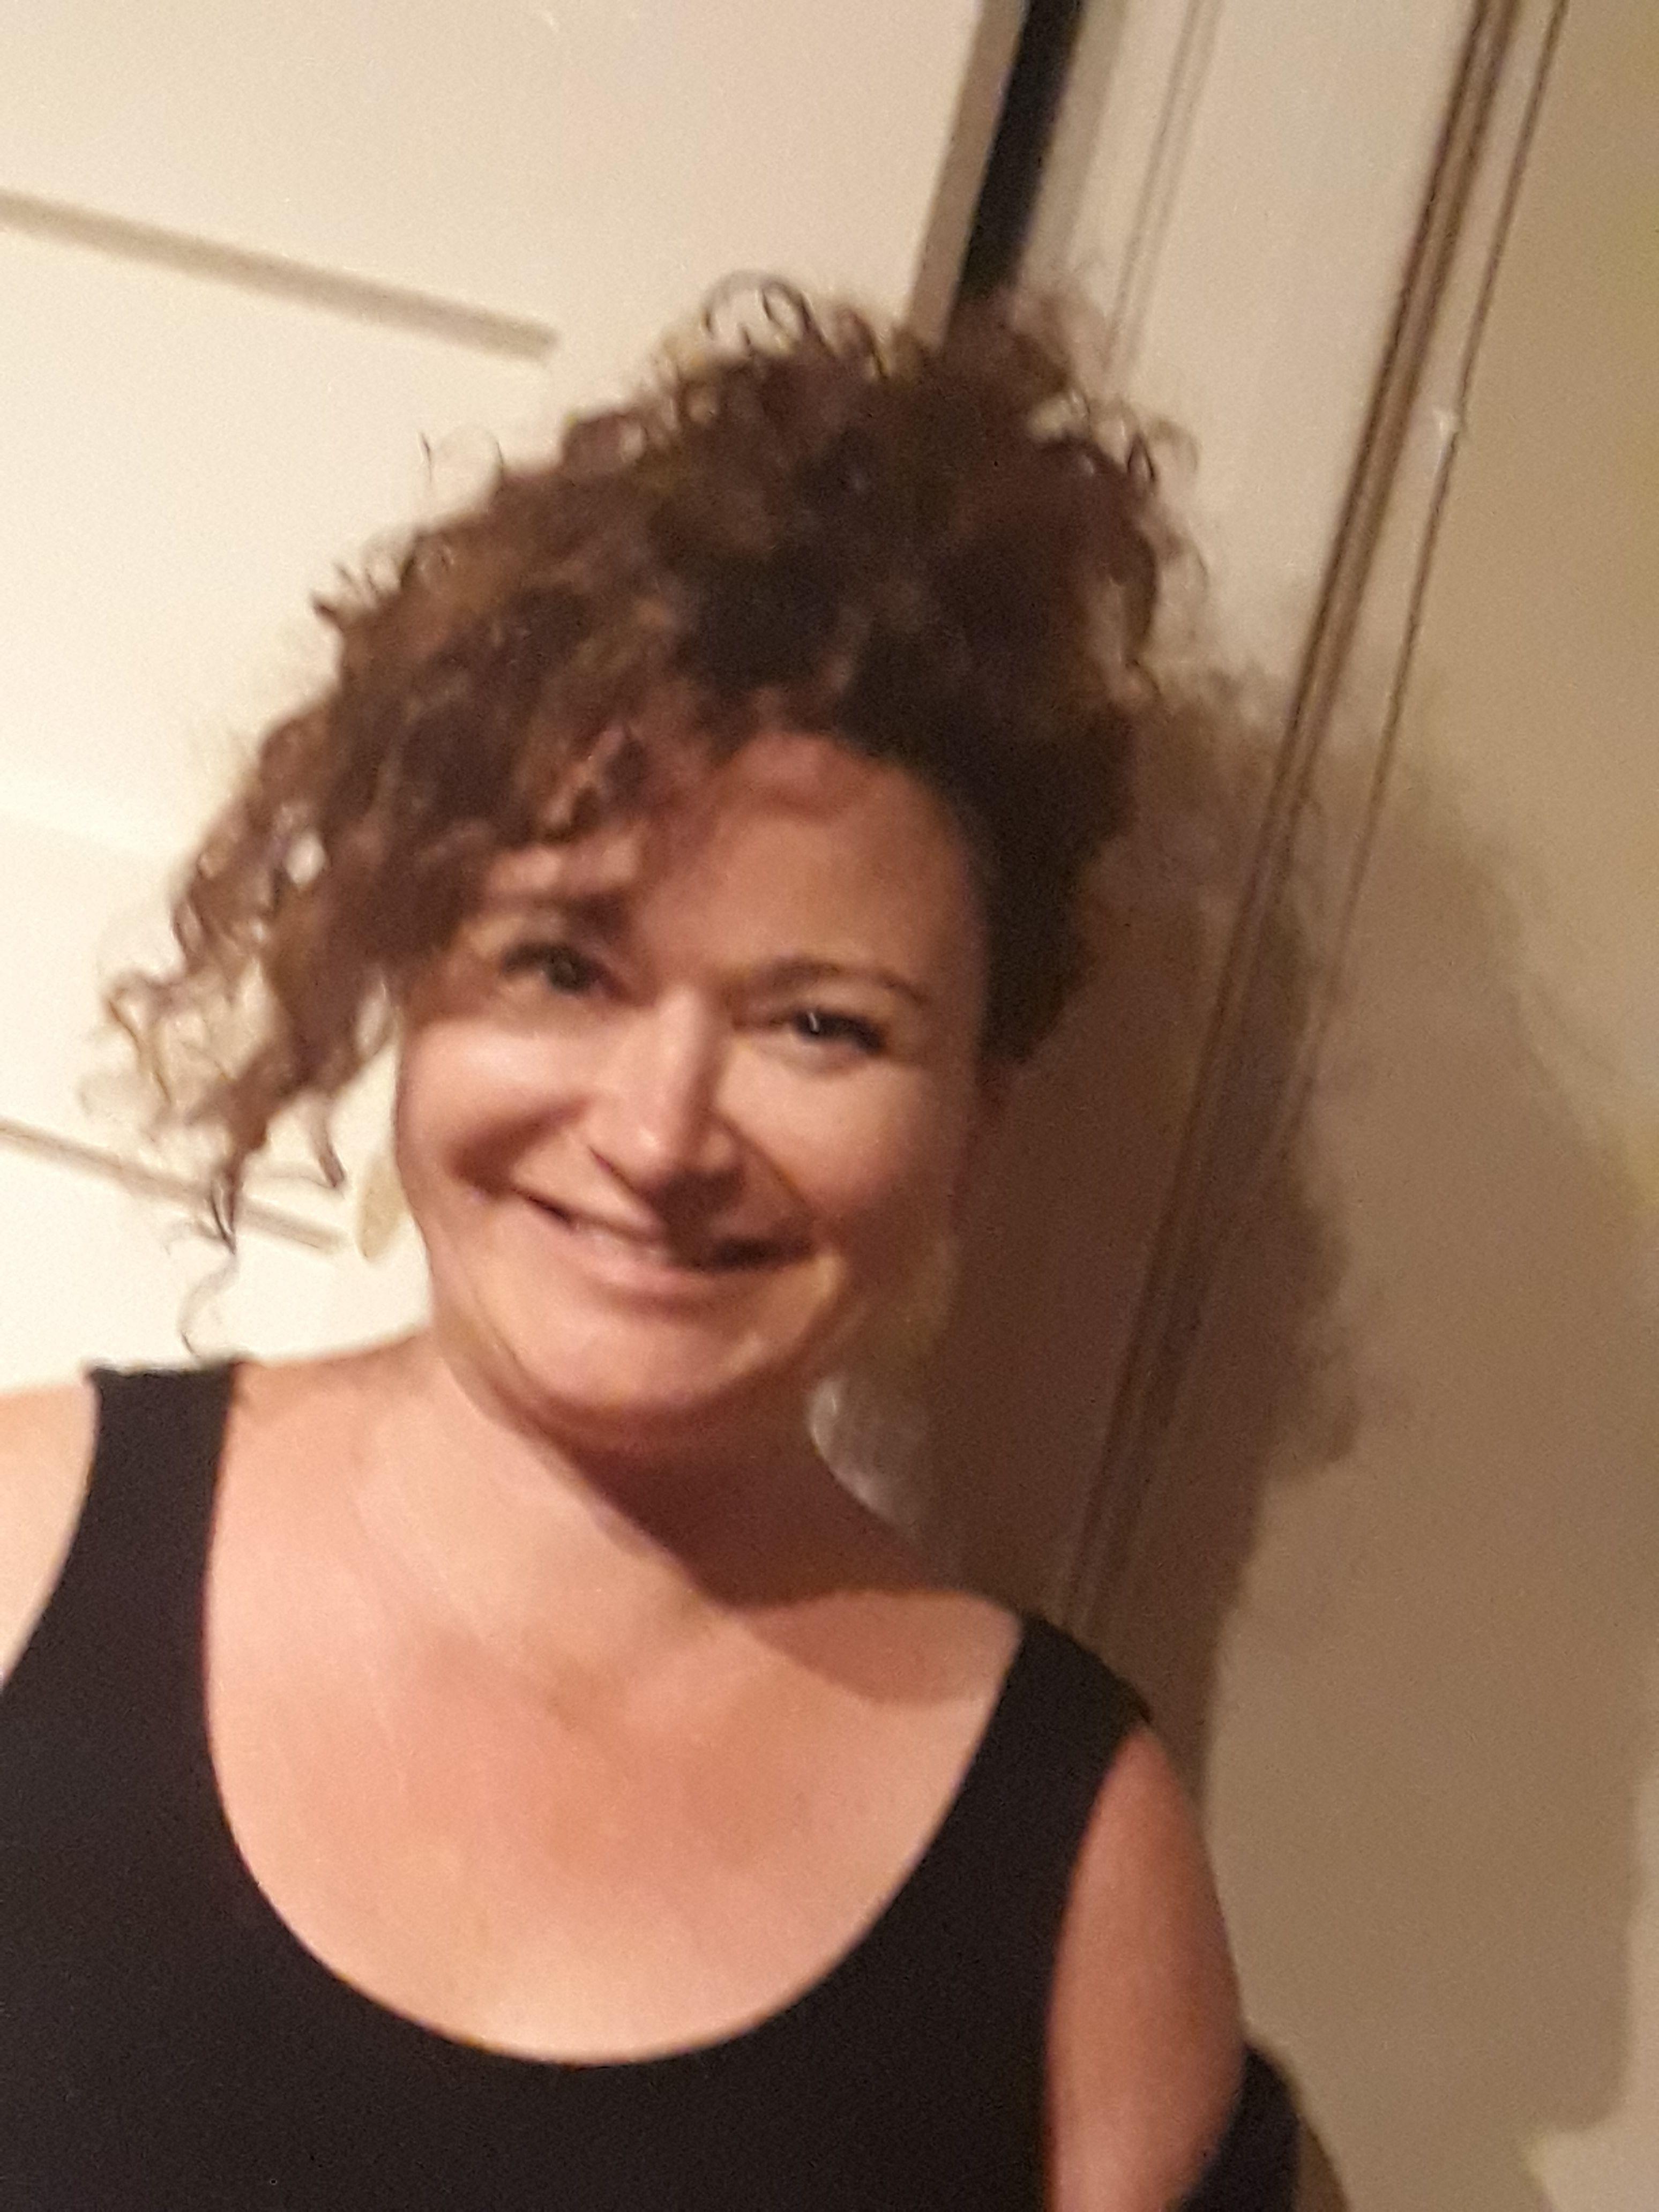 Renata - SWaNK Meetup for Single Women and No Kids in